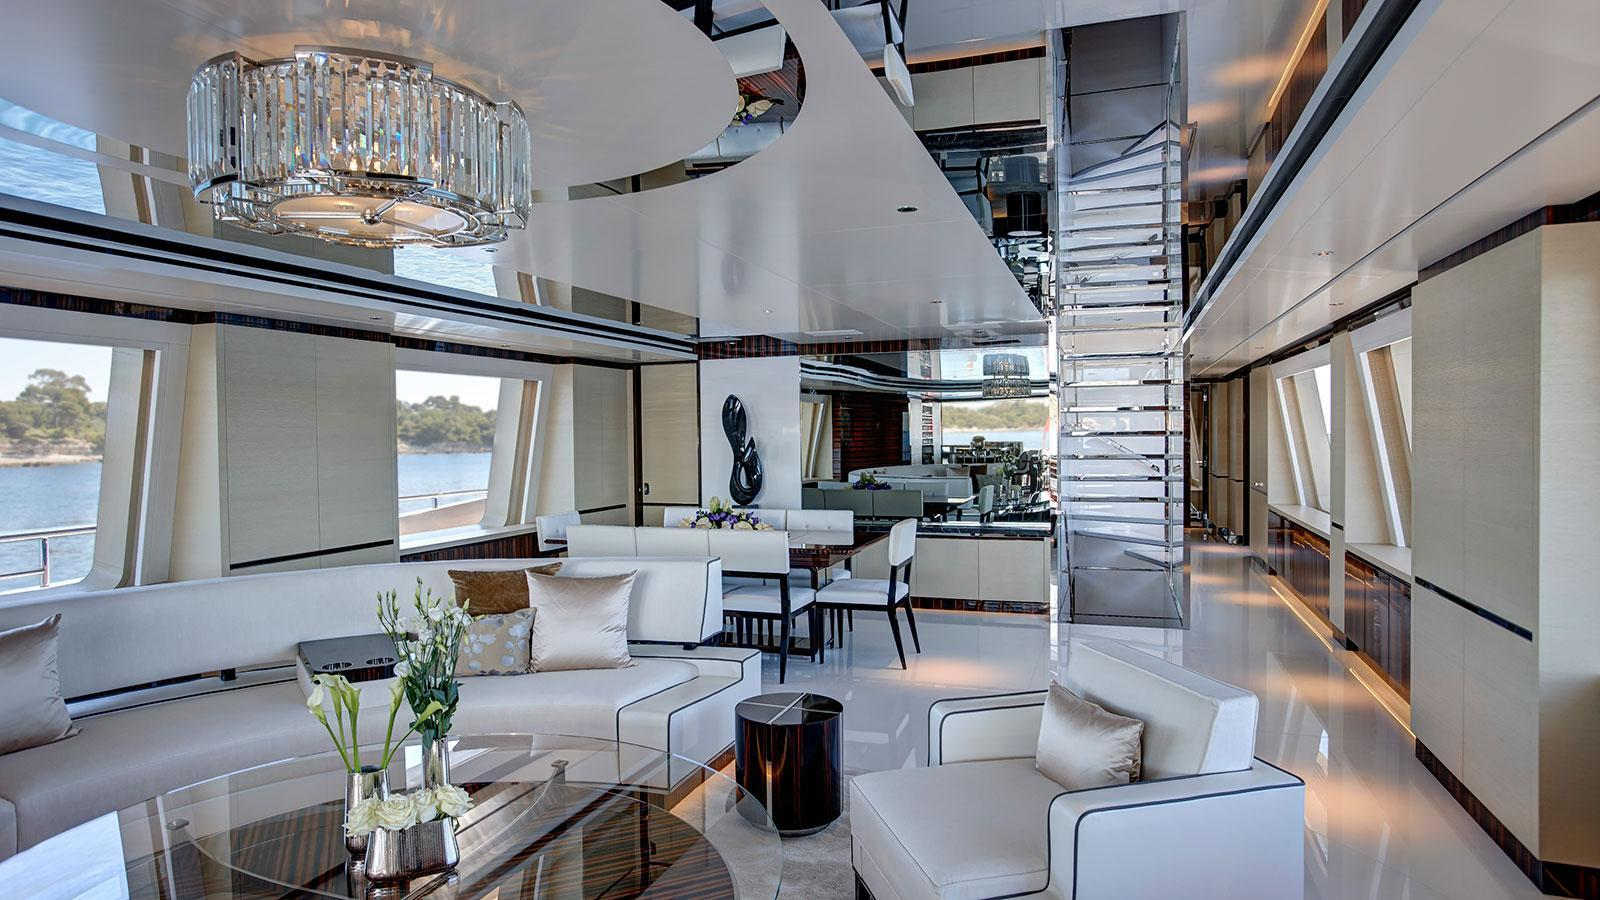 lady-may-motor-yacht-feadship-46m-2014-circular-seating-saloon